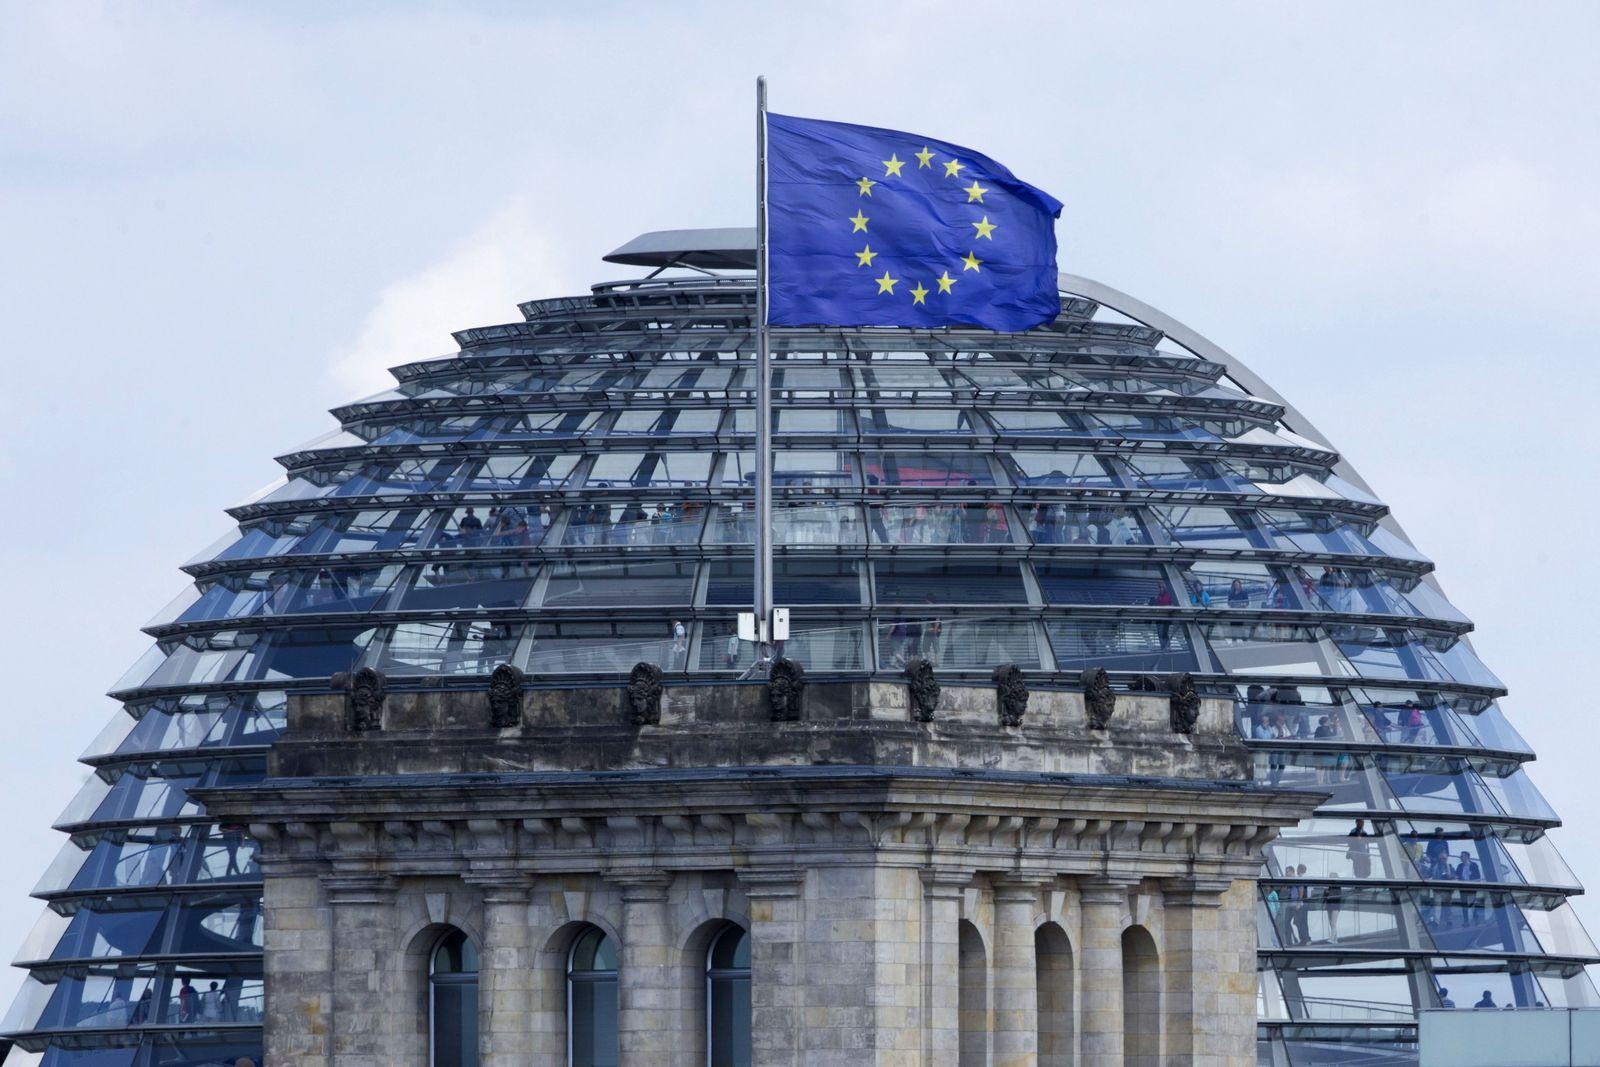 Europa / Flagge / Reichstag